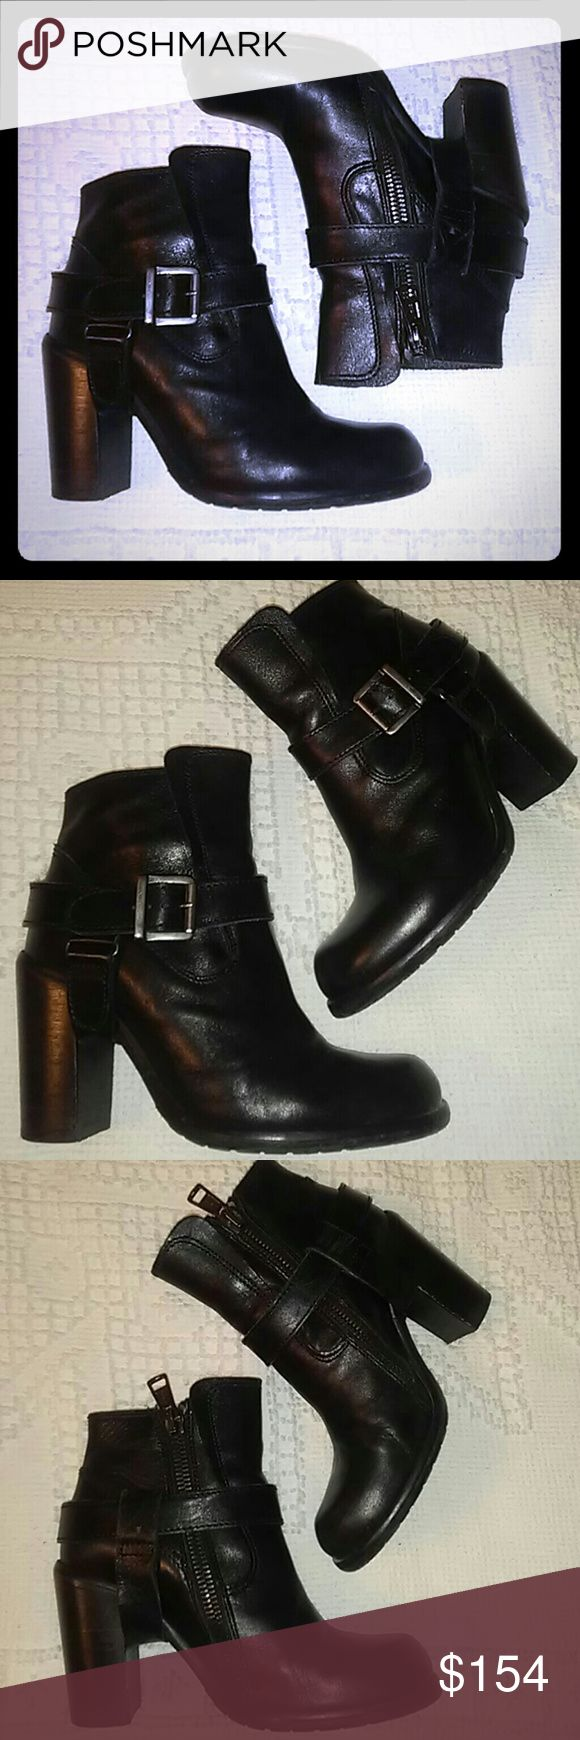 ALL SAINTS Jules Biker Moto Ankle Boots Sz38 EUC. I typically wear size 7.5 All Saints Shoes Ankle Boots & Booties